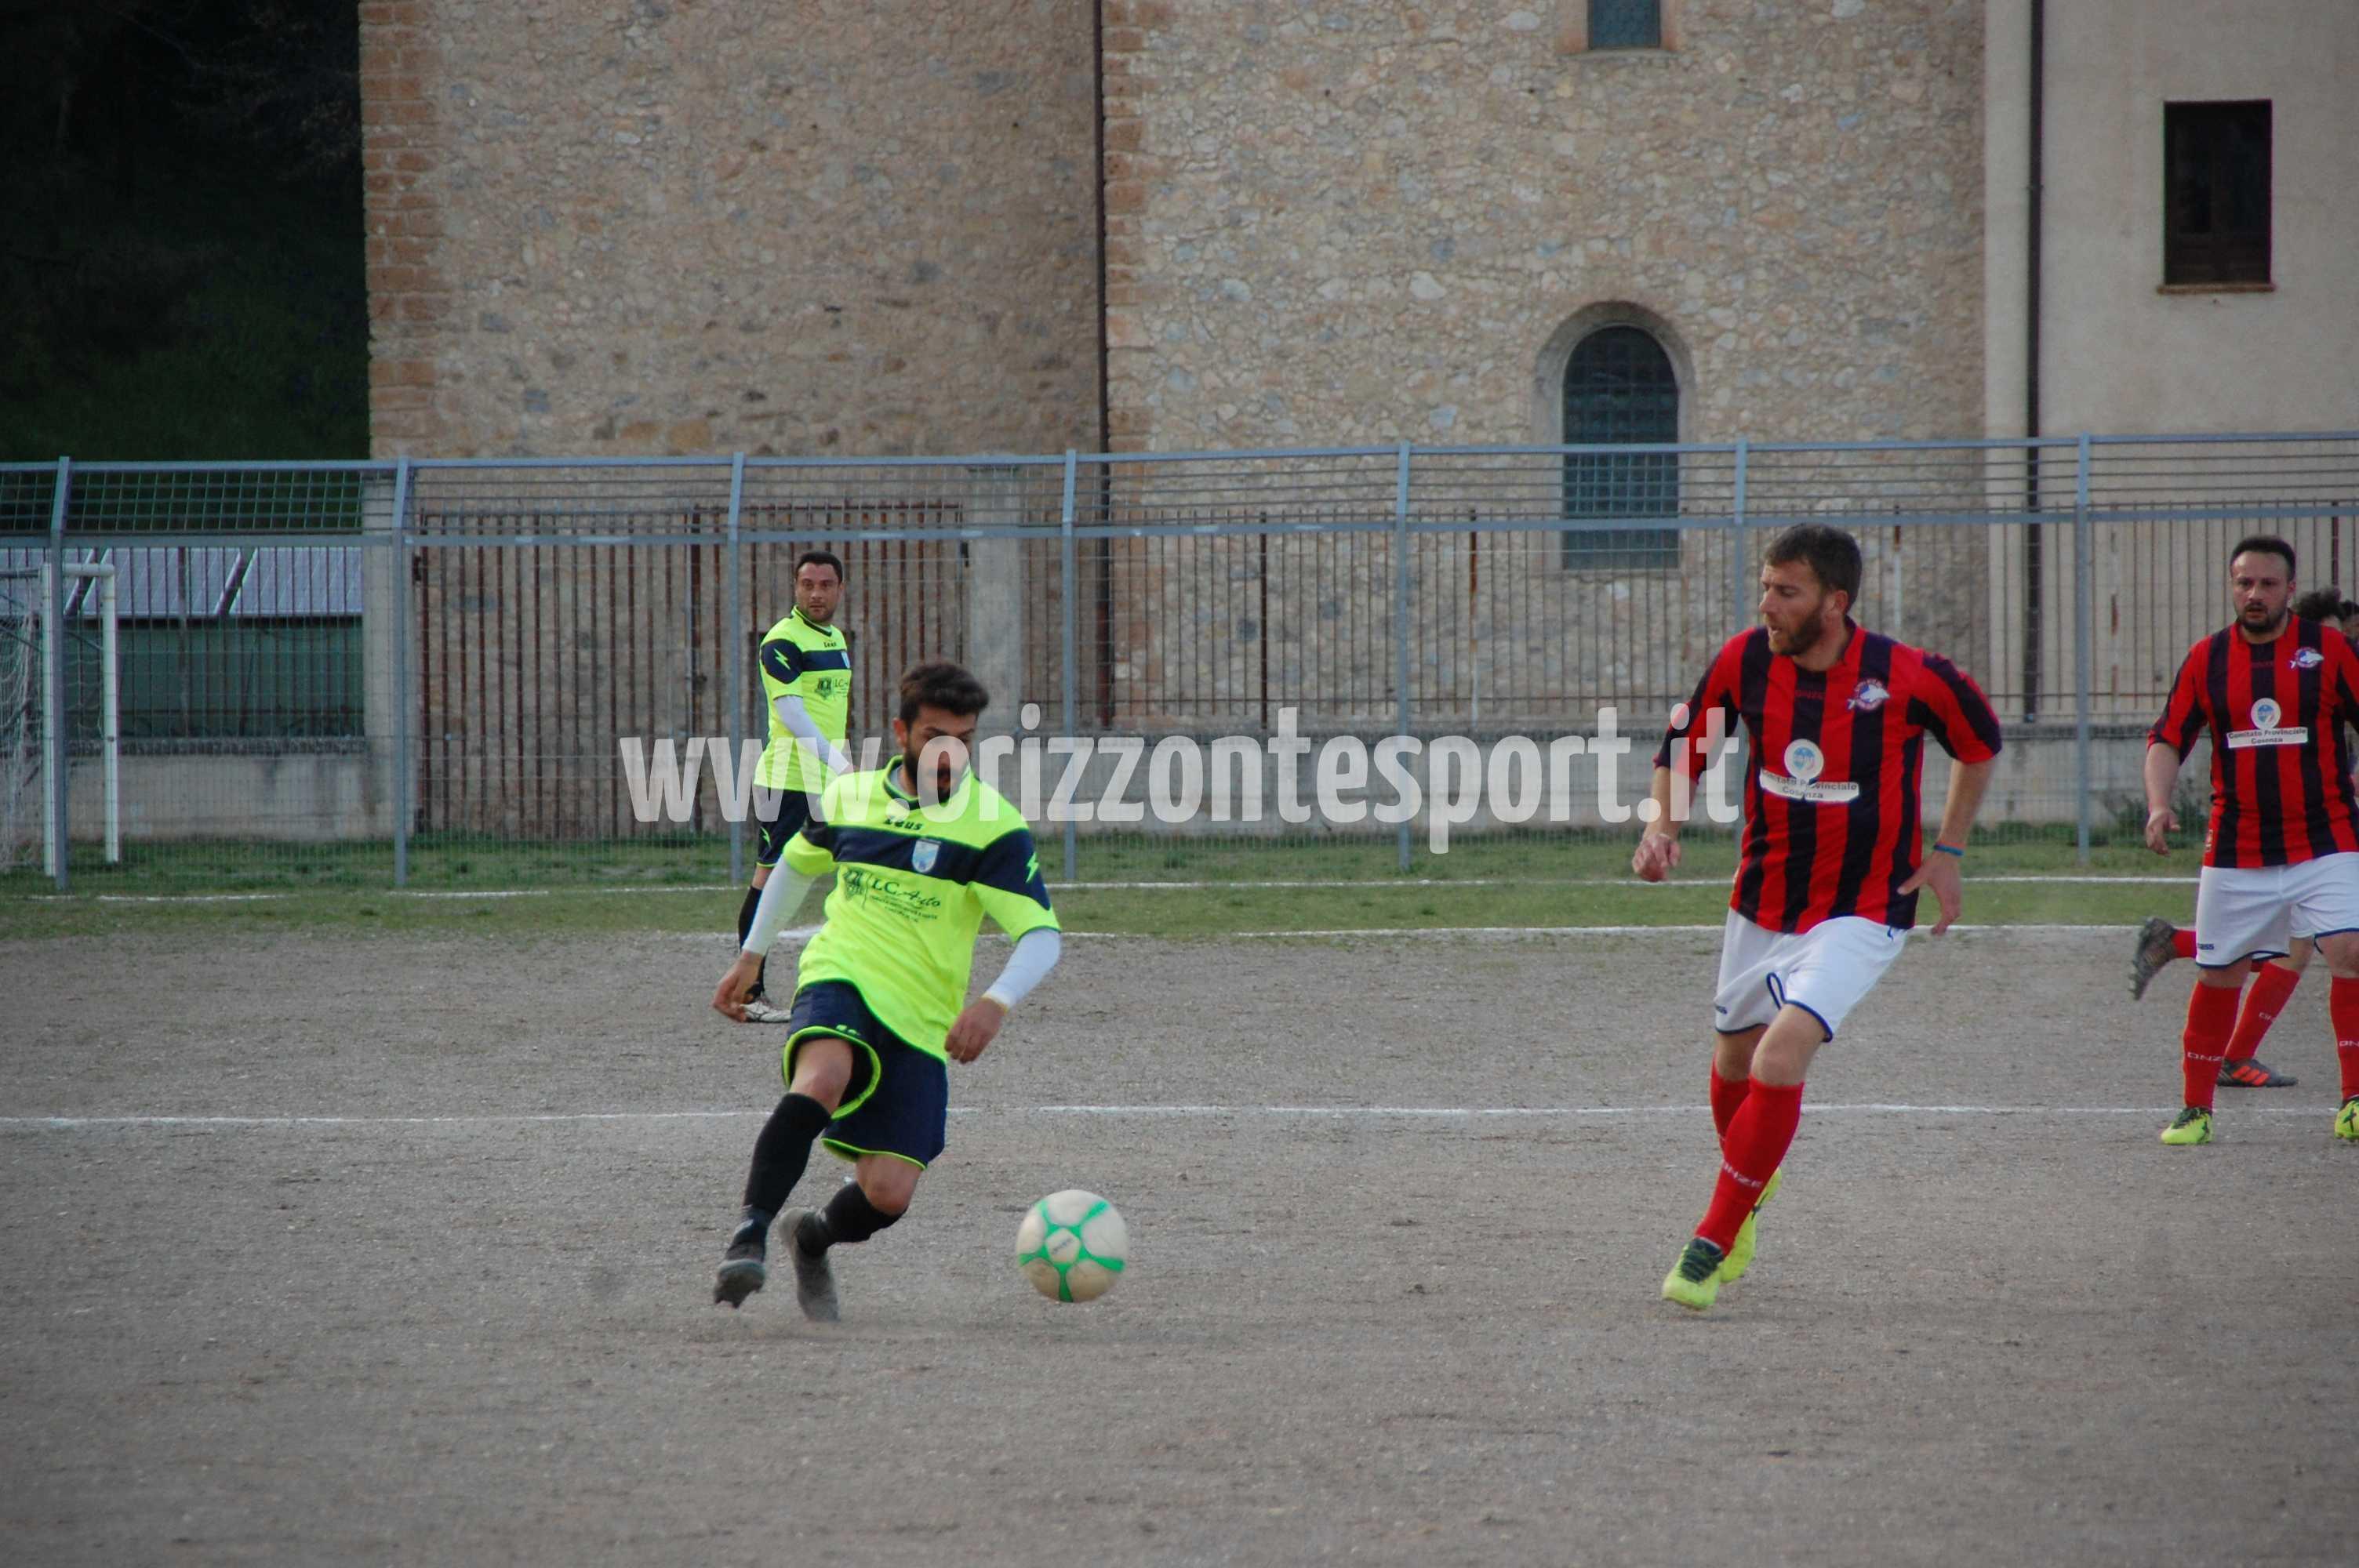 gnettimorano_praiatortora (117)